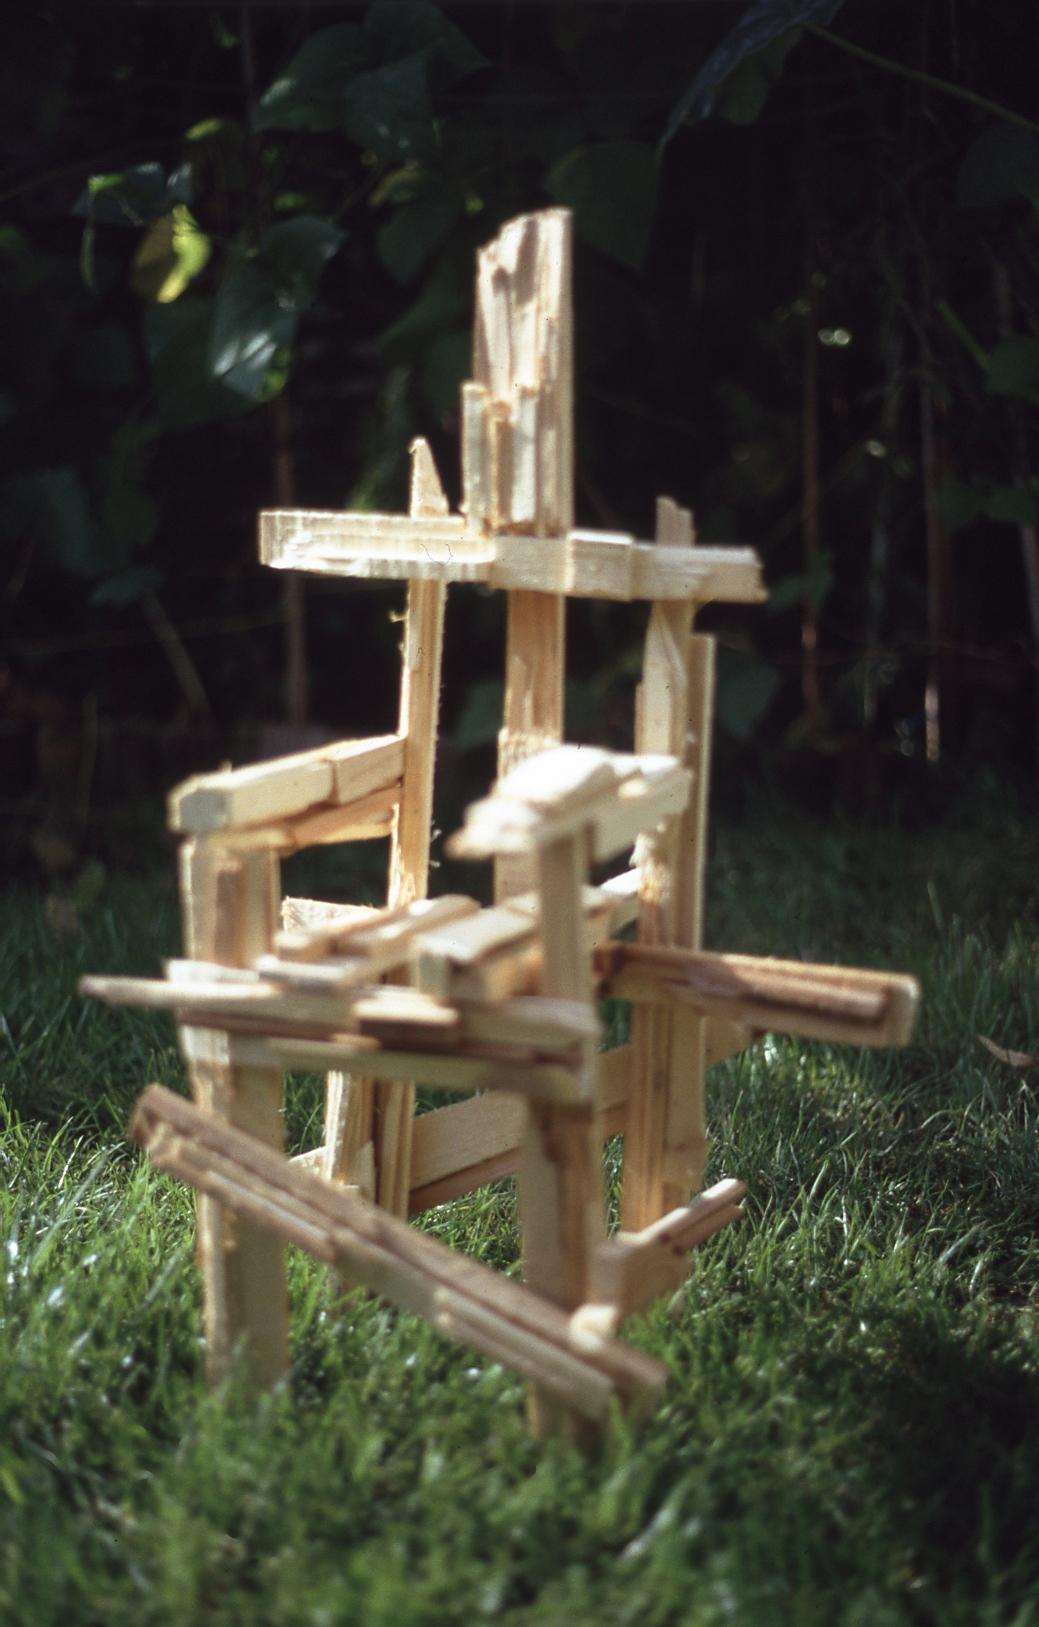 Chair Sculptures - Mixed Media